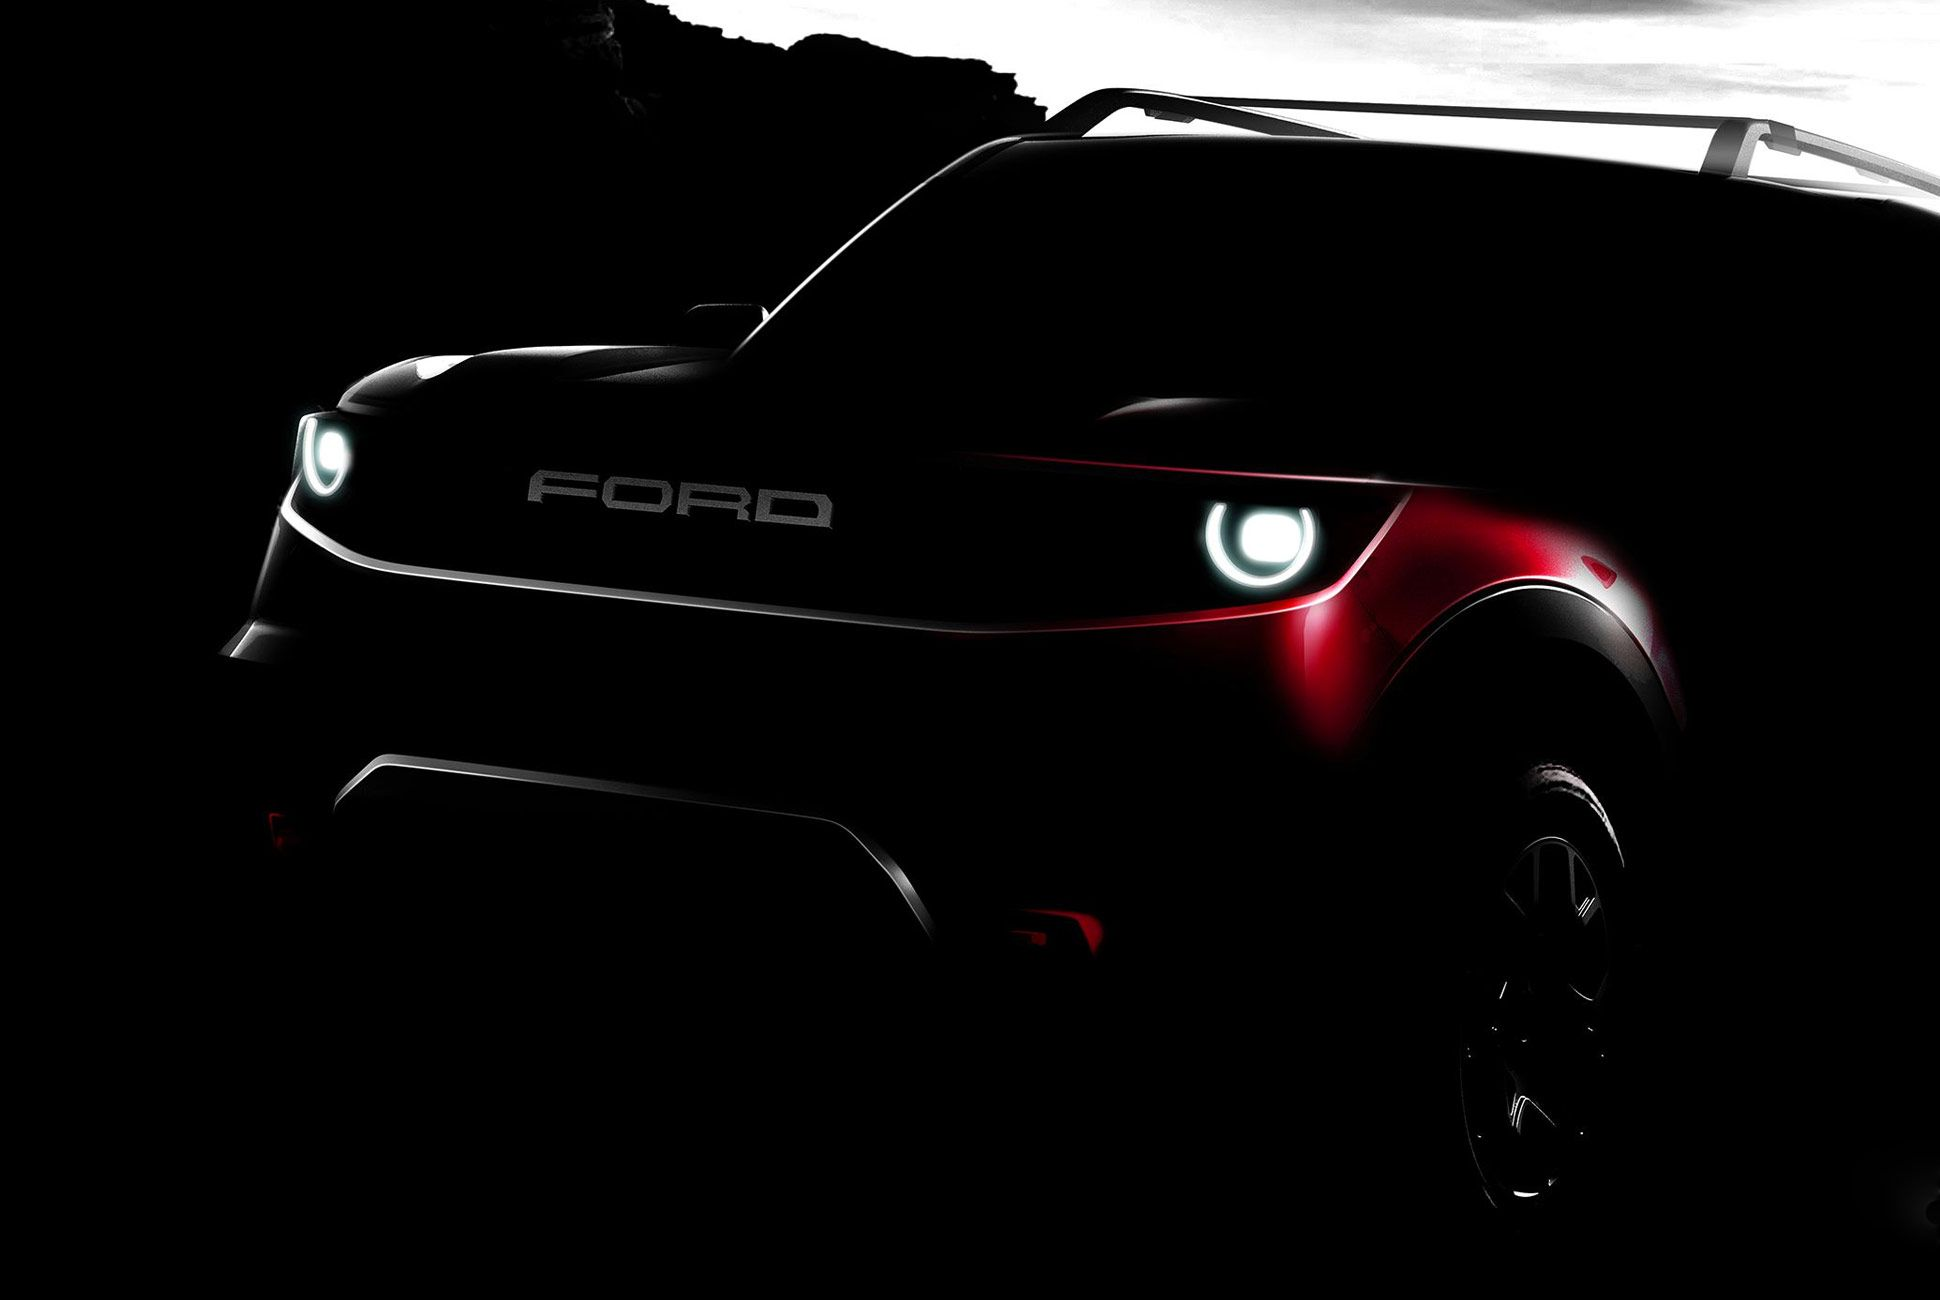 2020-Ford-Bronco-First-Look-gear-patrol-slide-2